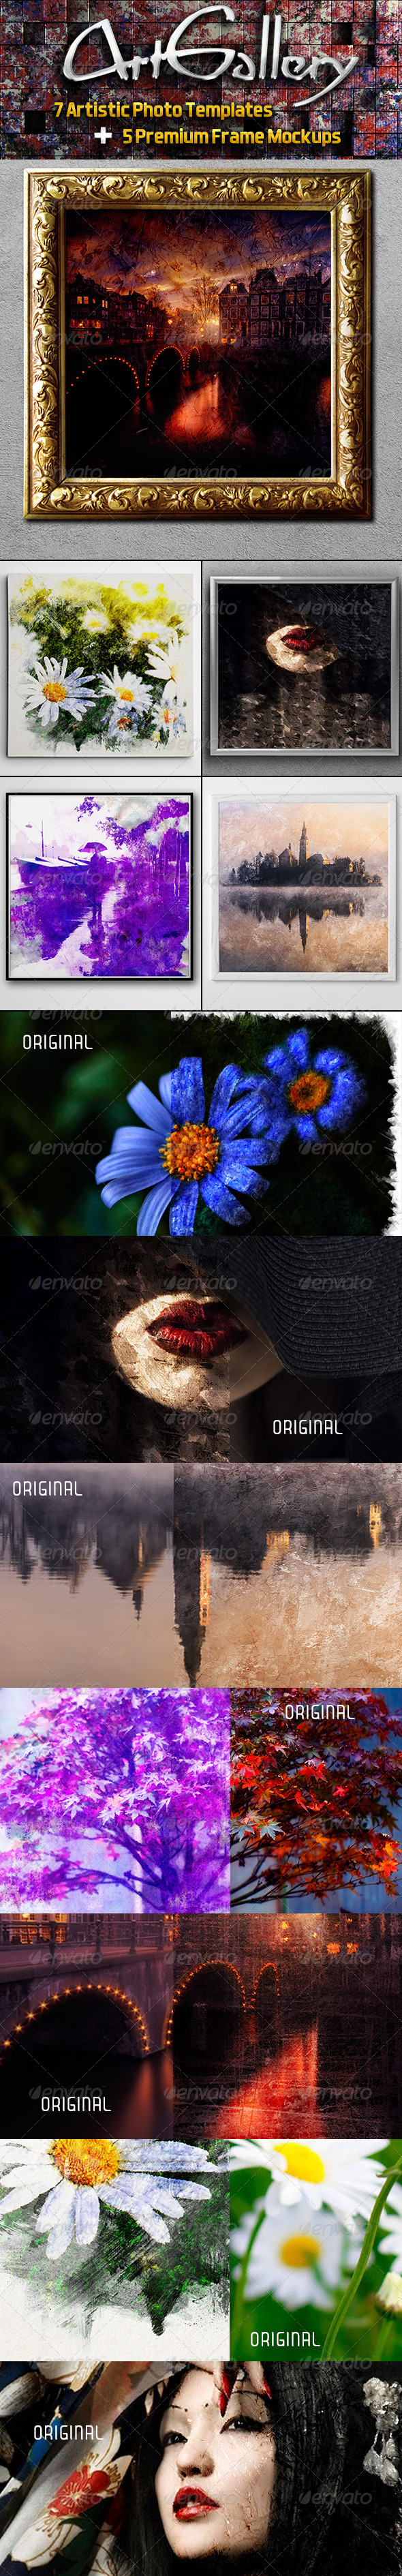 GraphicRiver Art Gallery 7725493